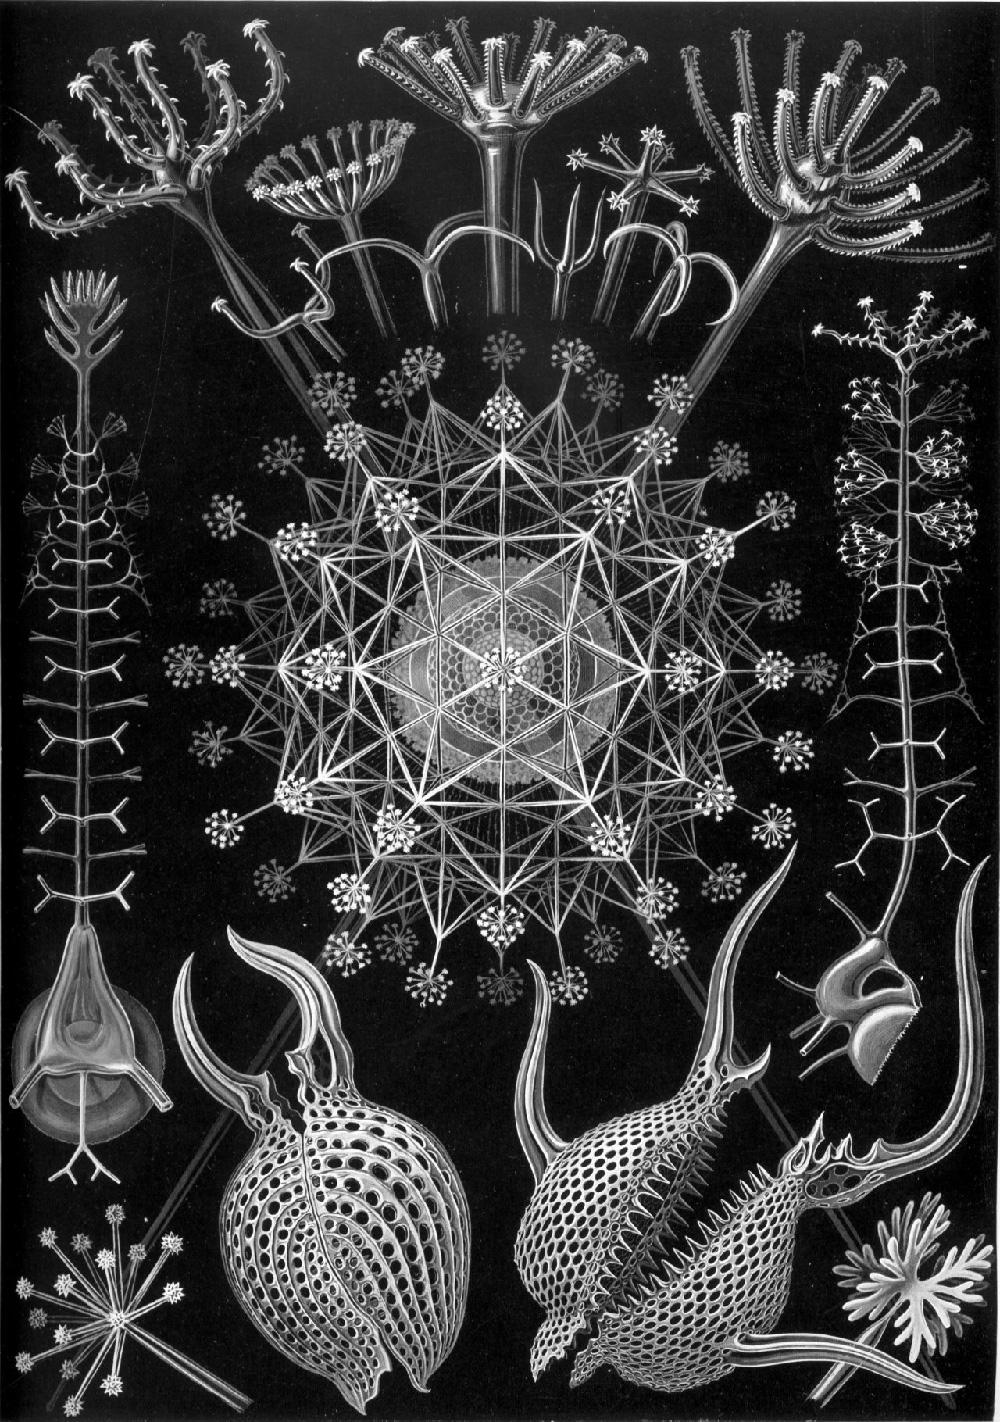 Phaeodaria–Rohrstrahlinge